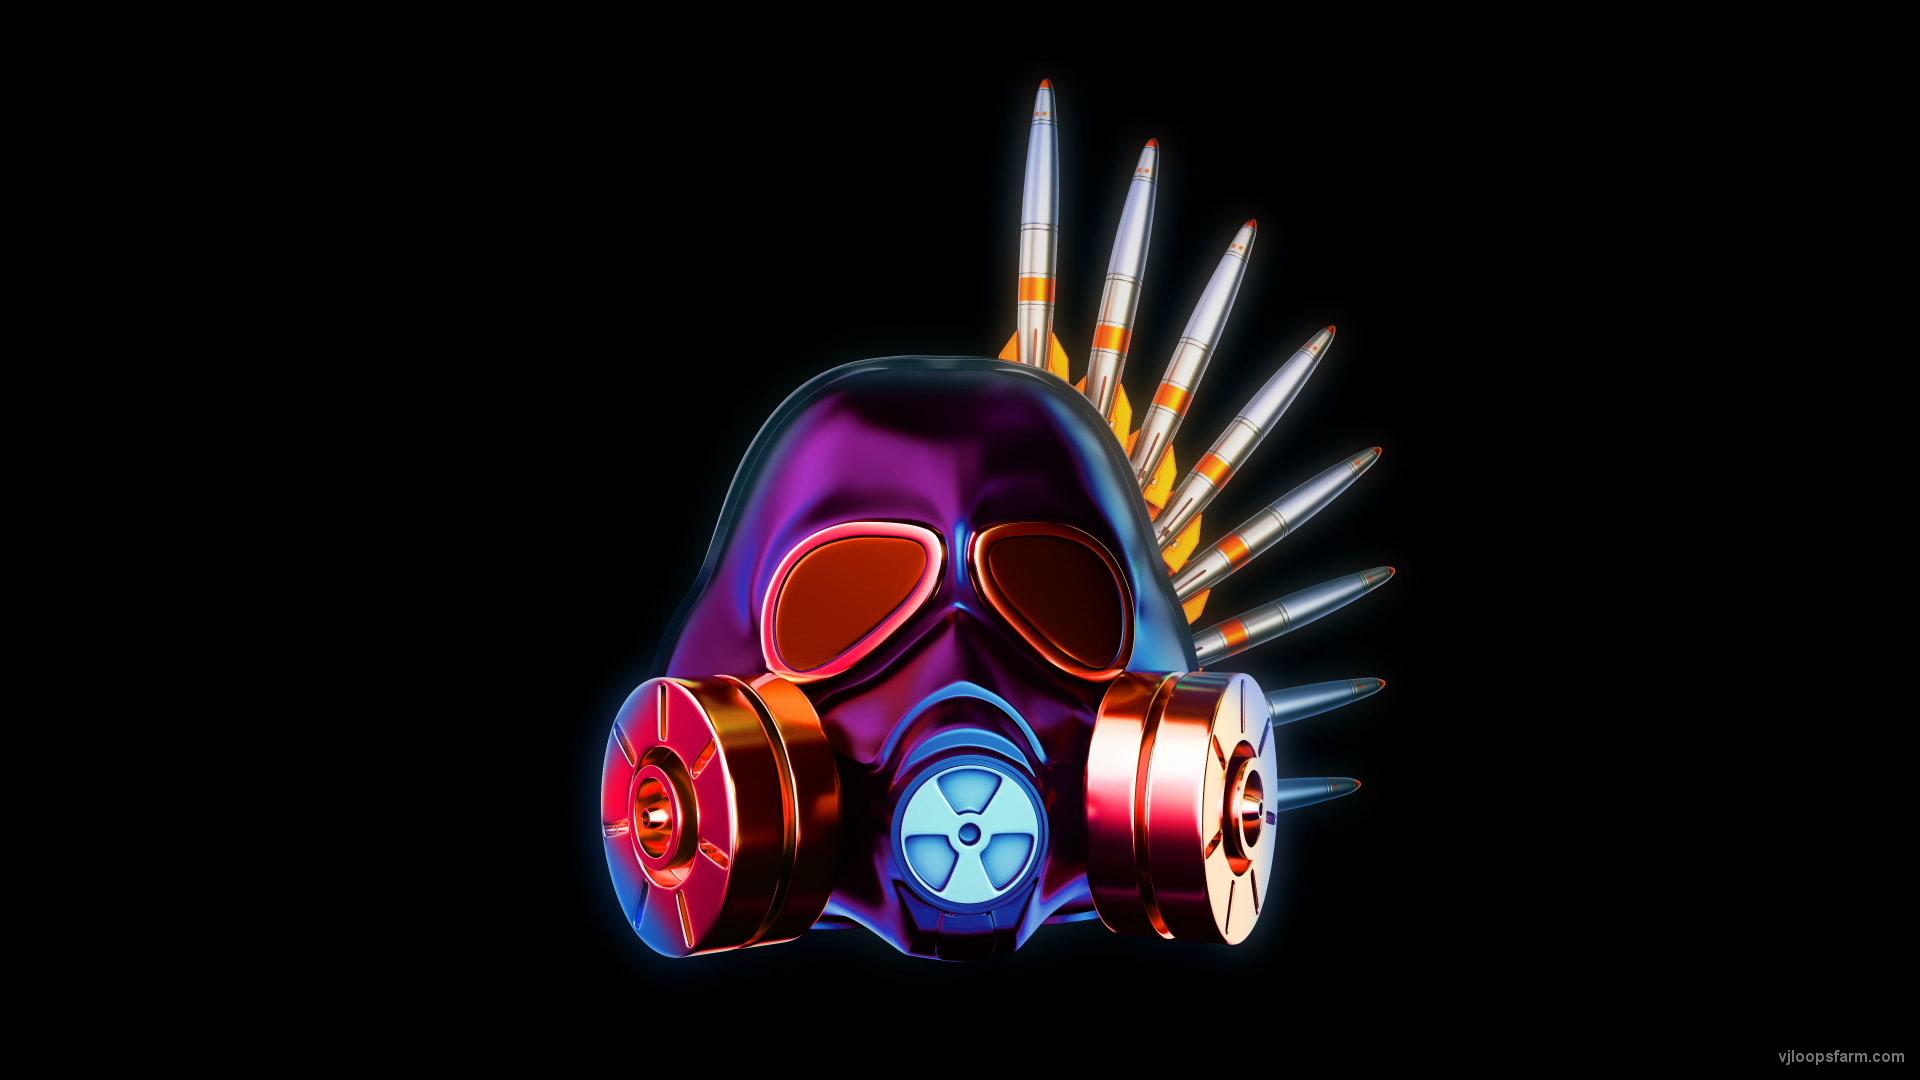 vj video background Metallic_Silver_Shiny_Gas_Mask_Warhead_Missile_Crown_Full_HD_VJ_Loop_003